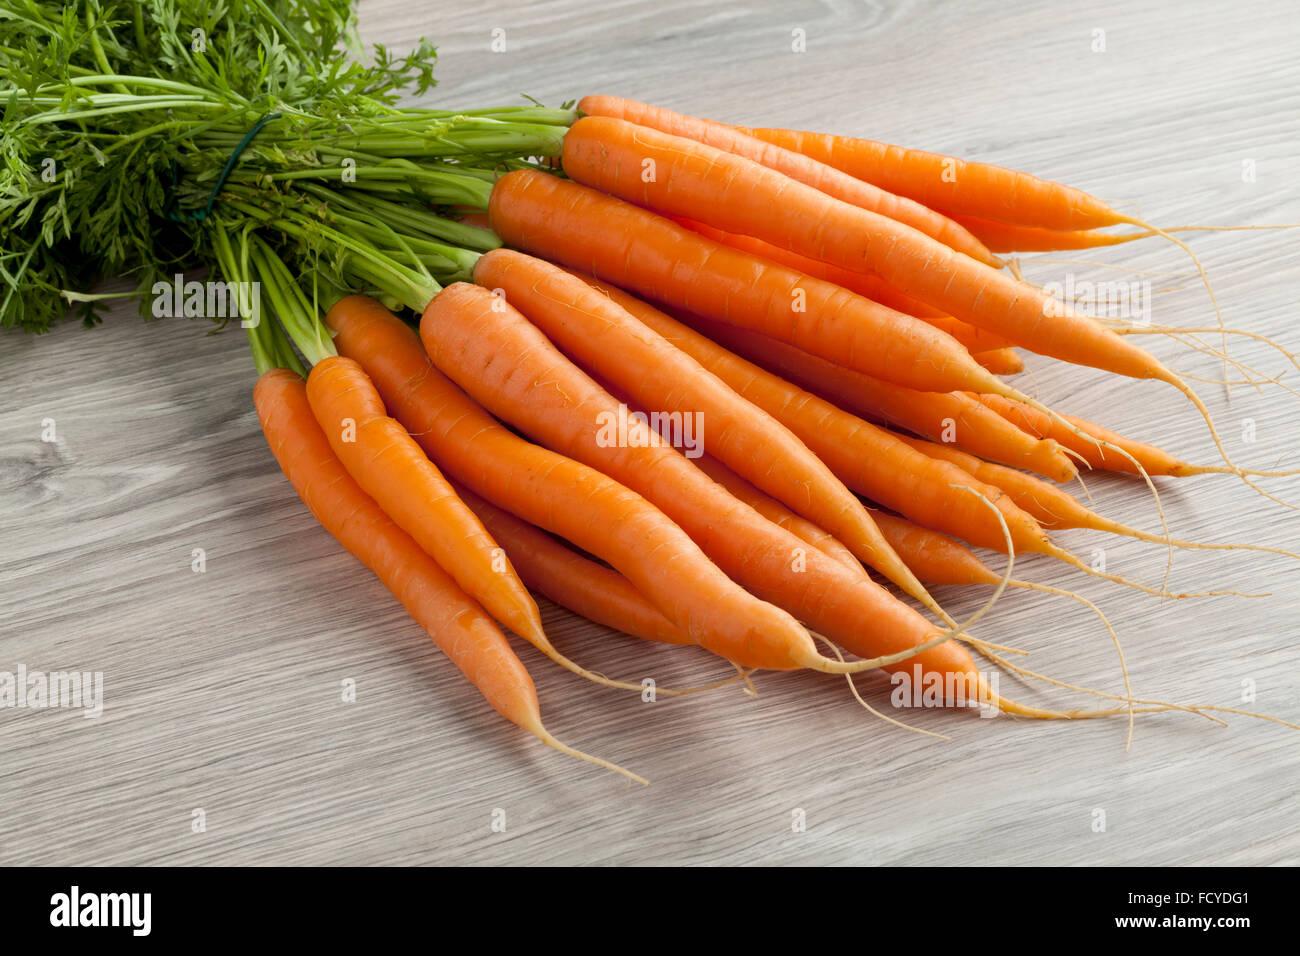 Fresh bunch of orange carrots - Stock Image